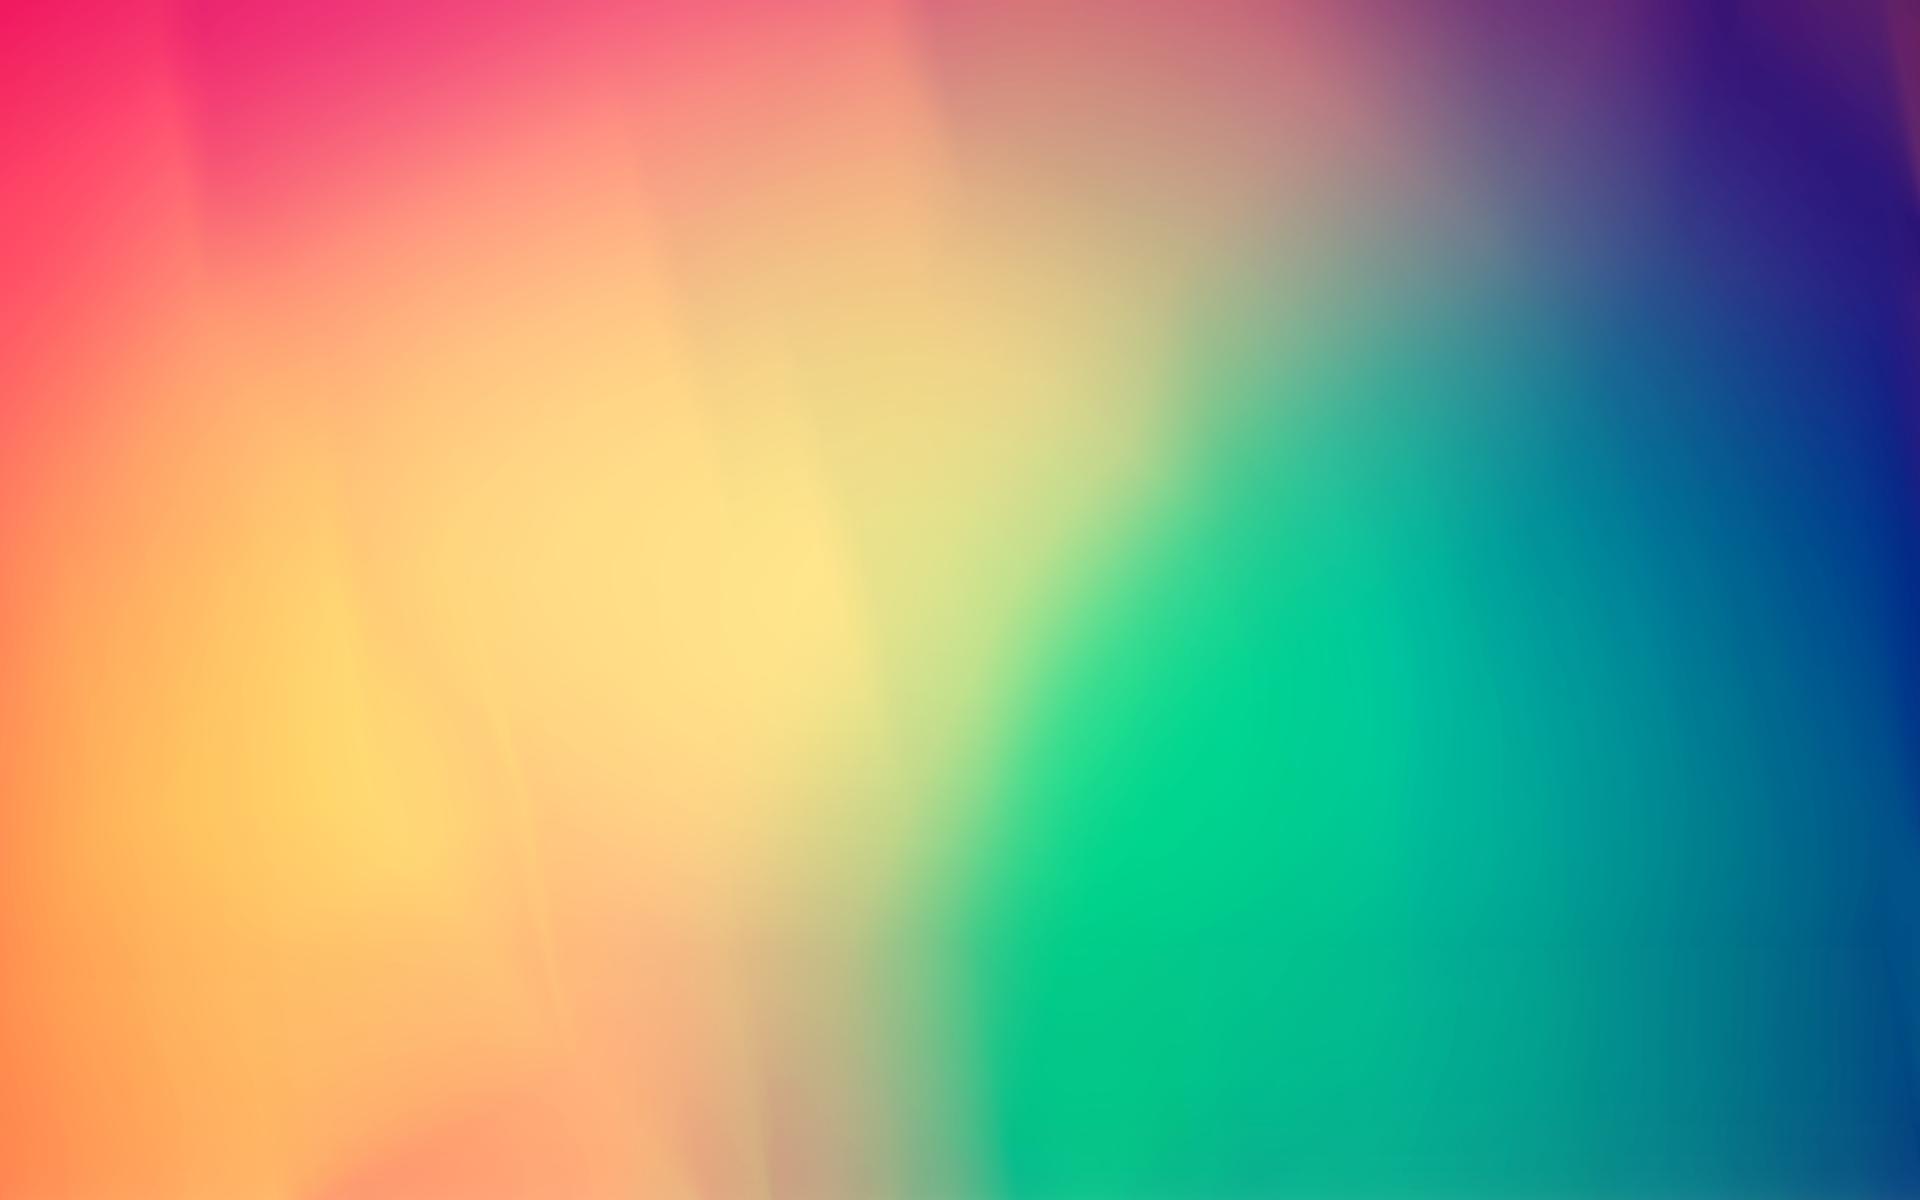 wallpaper-3012792